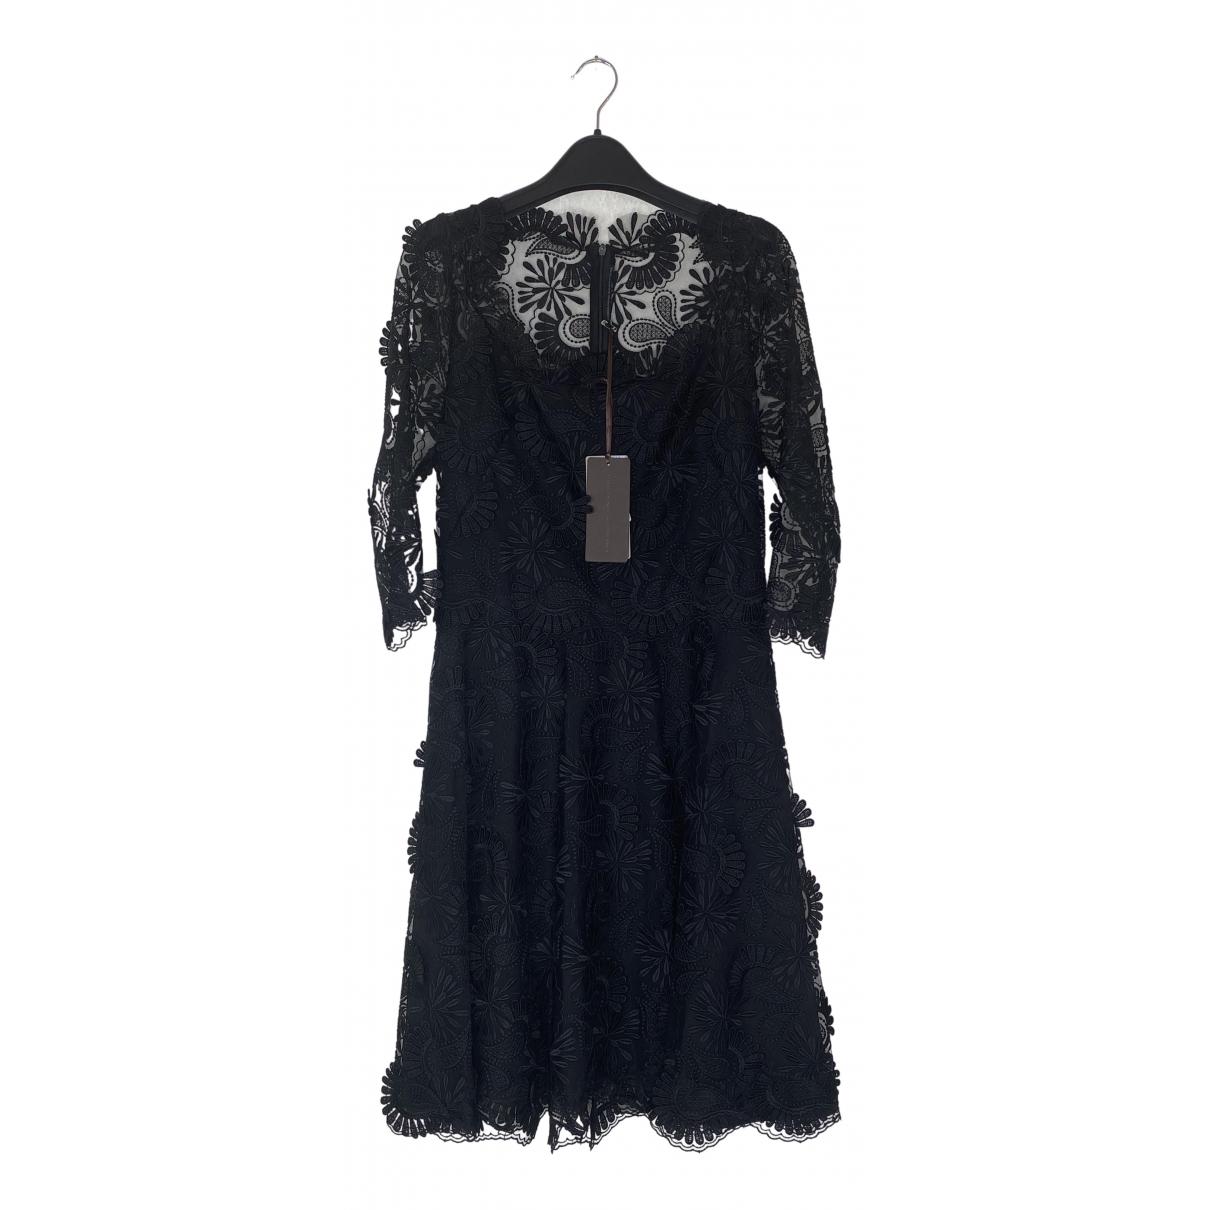 Ermanno Scervino \N Kleid in  Schwarz Spitze